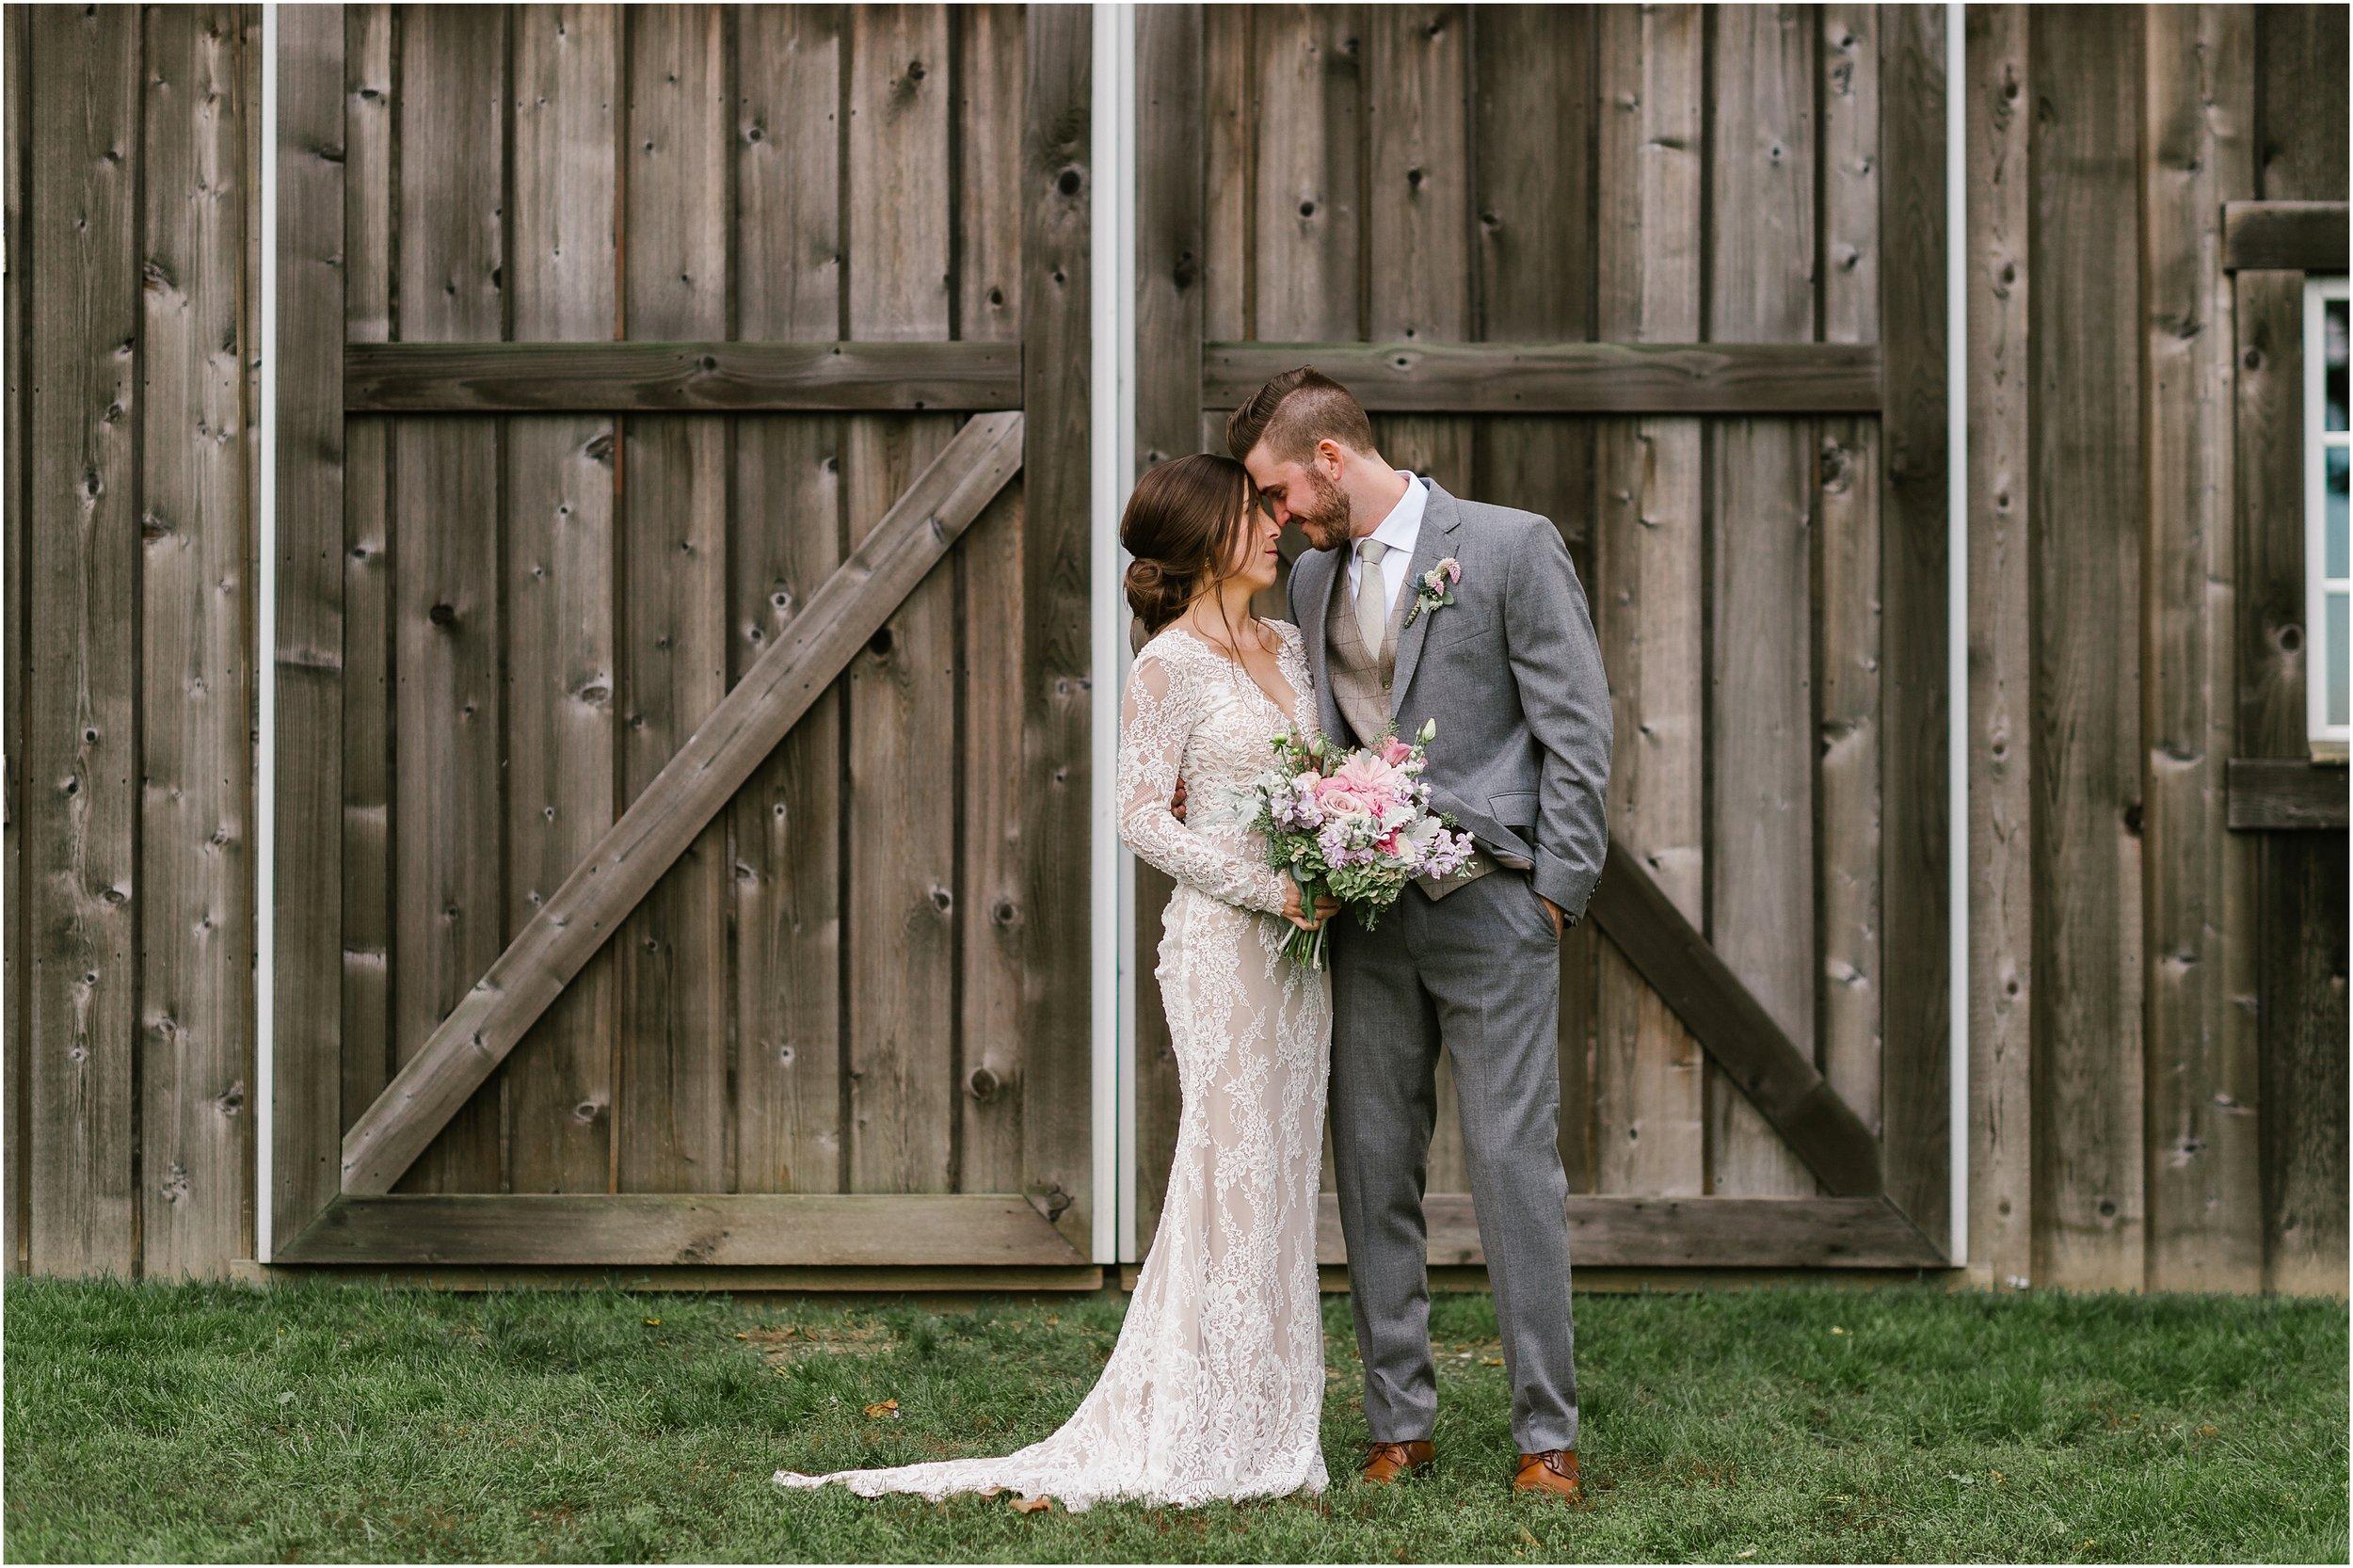 Rebecca_Shehorn_Photography_Indianapolis_Wedding_Photographer_9275.jpg